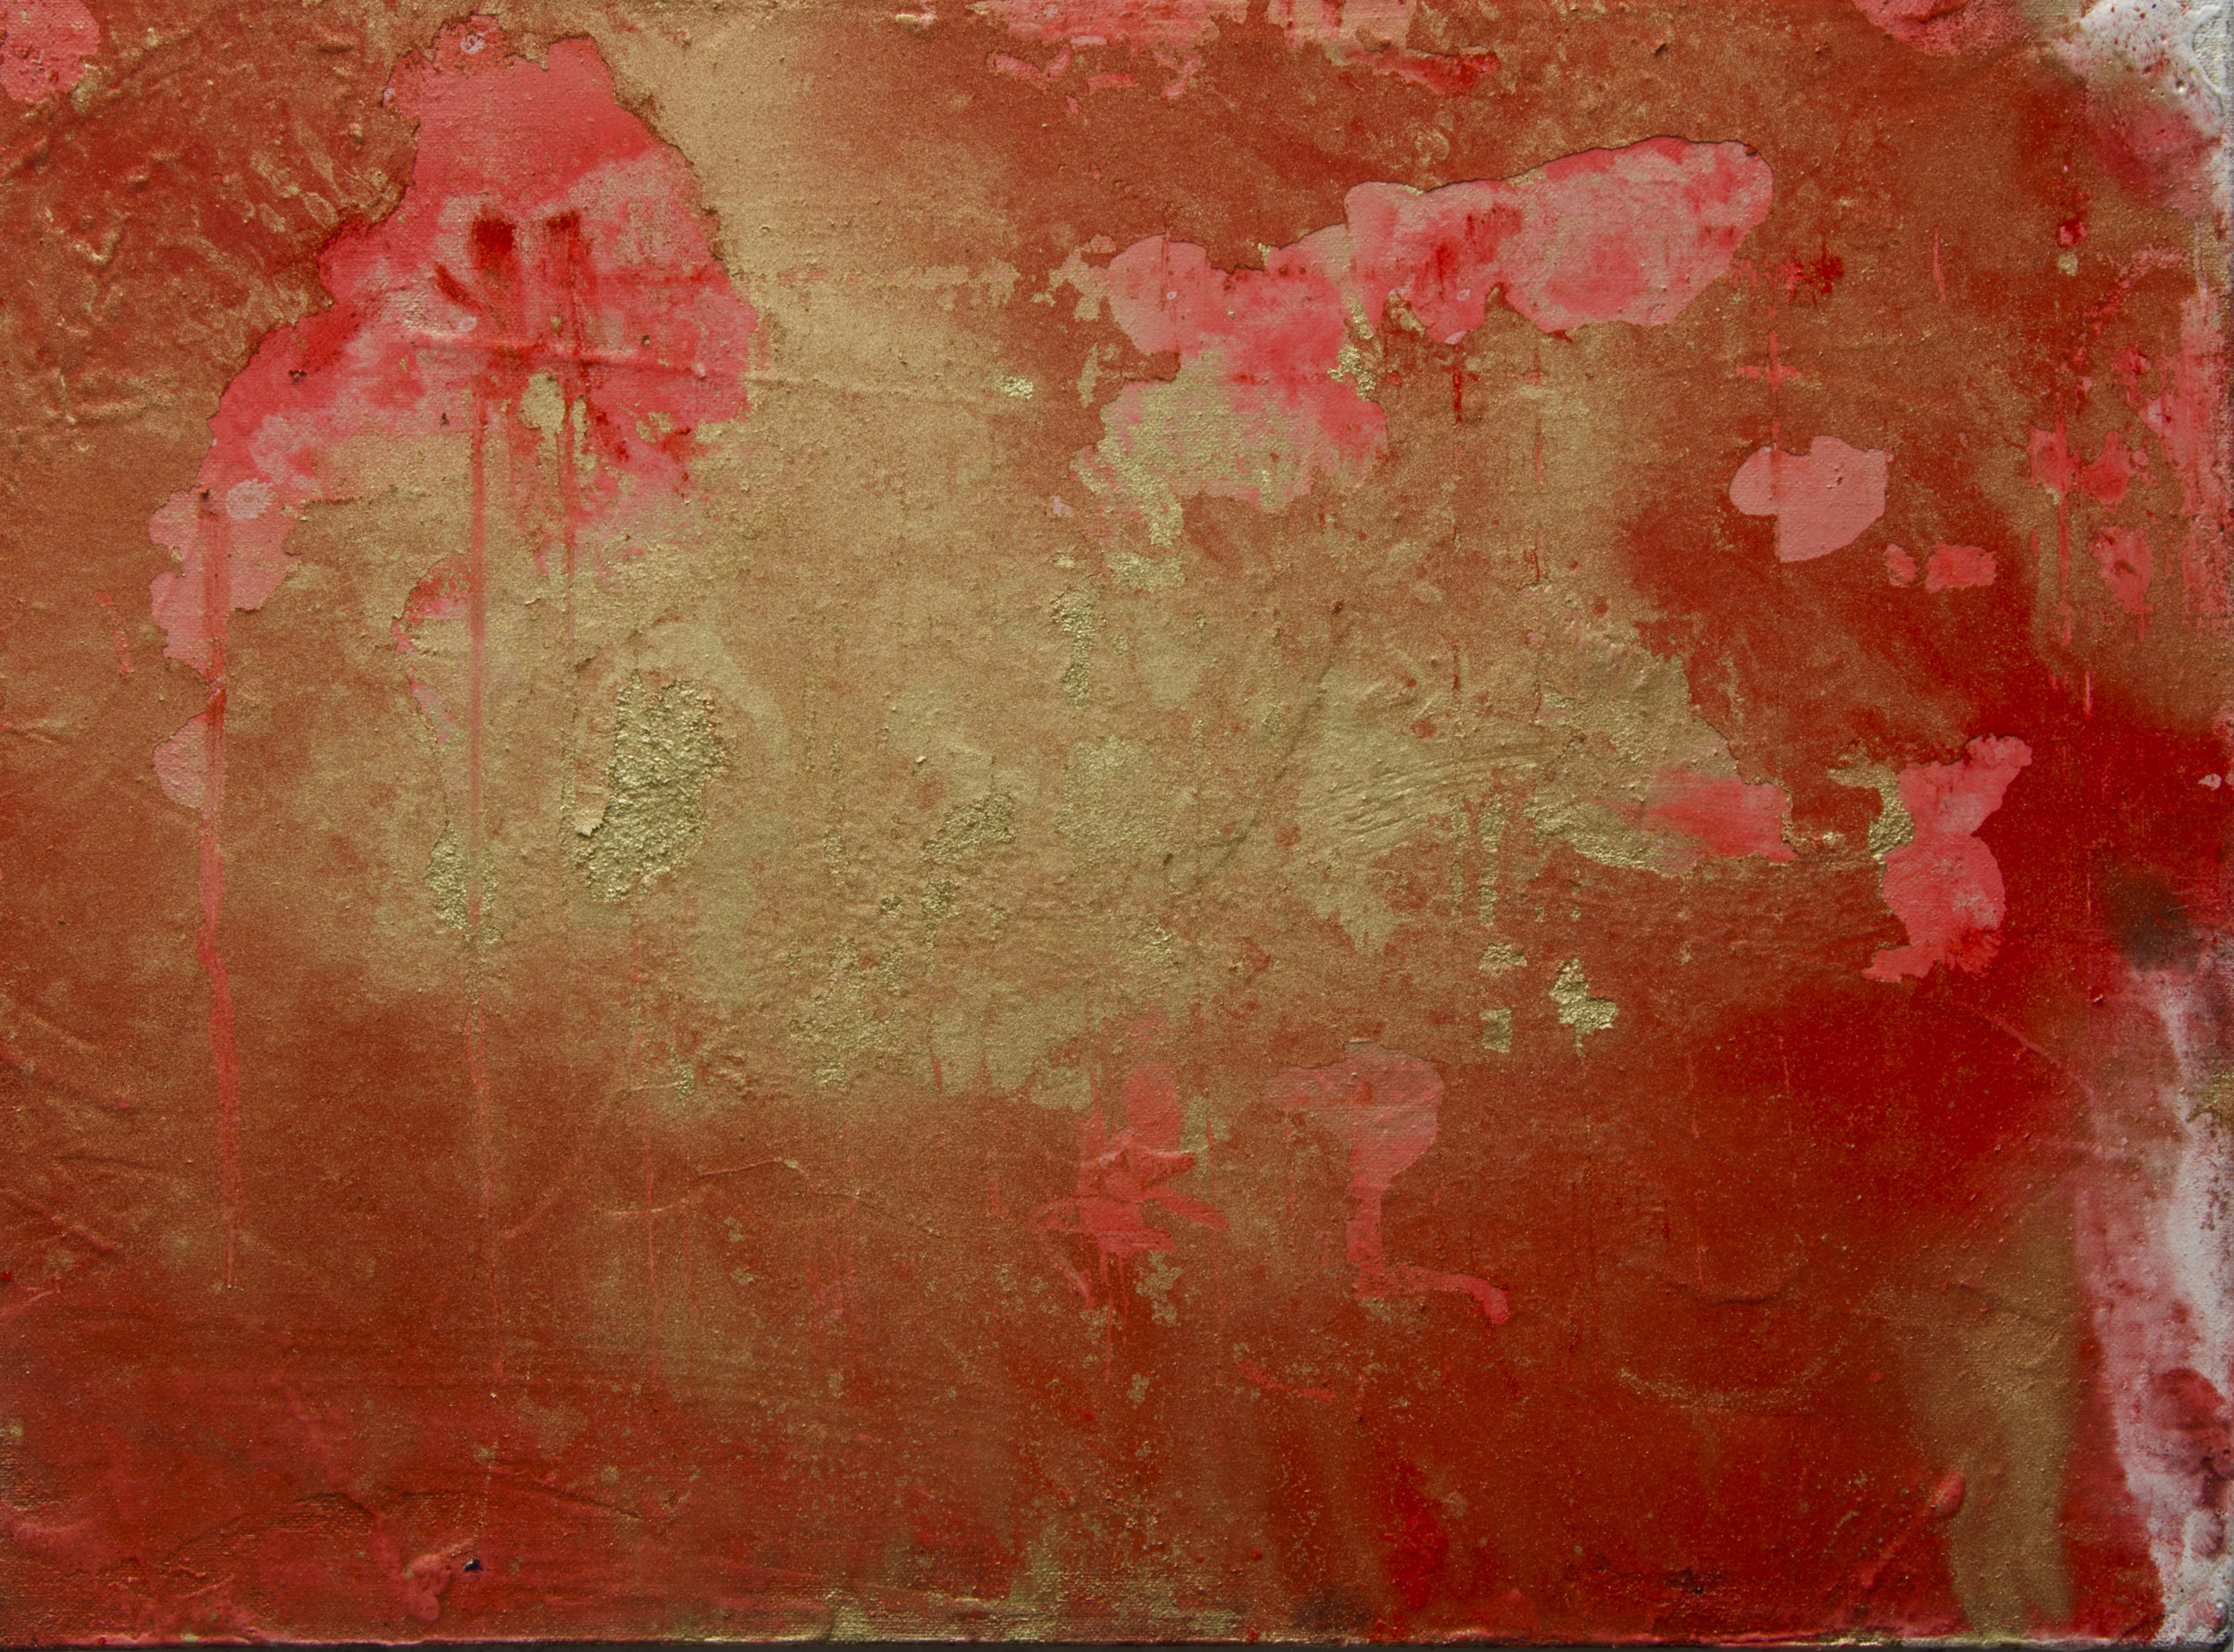 Oil on canvas.  2017.